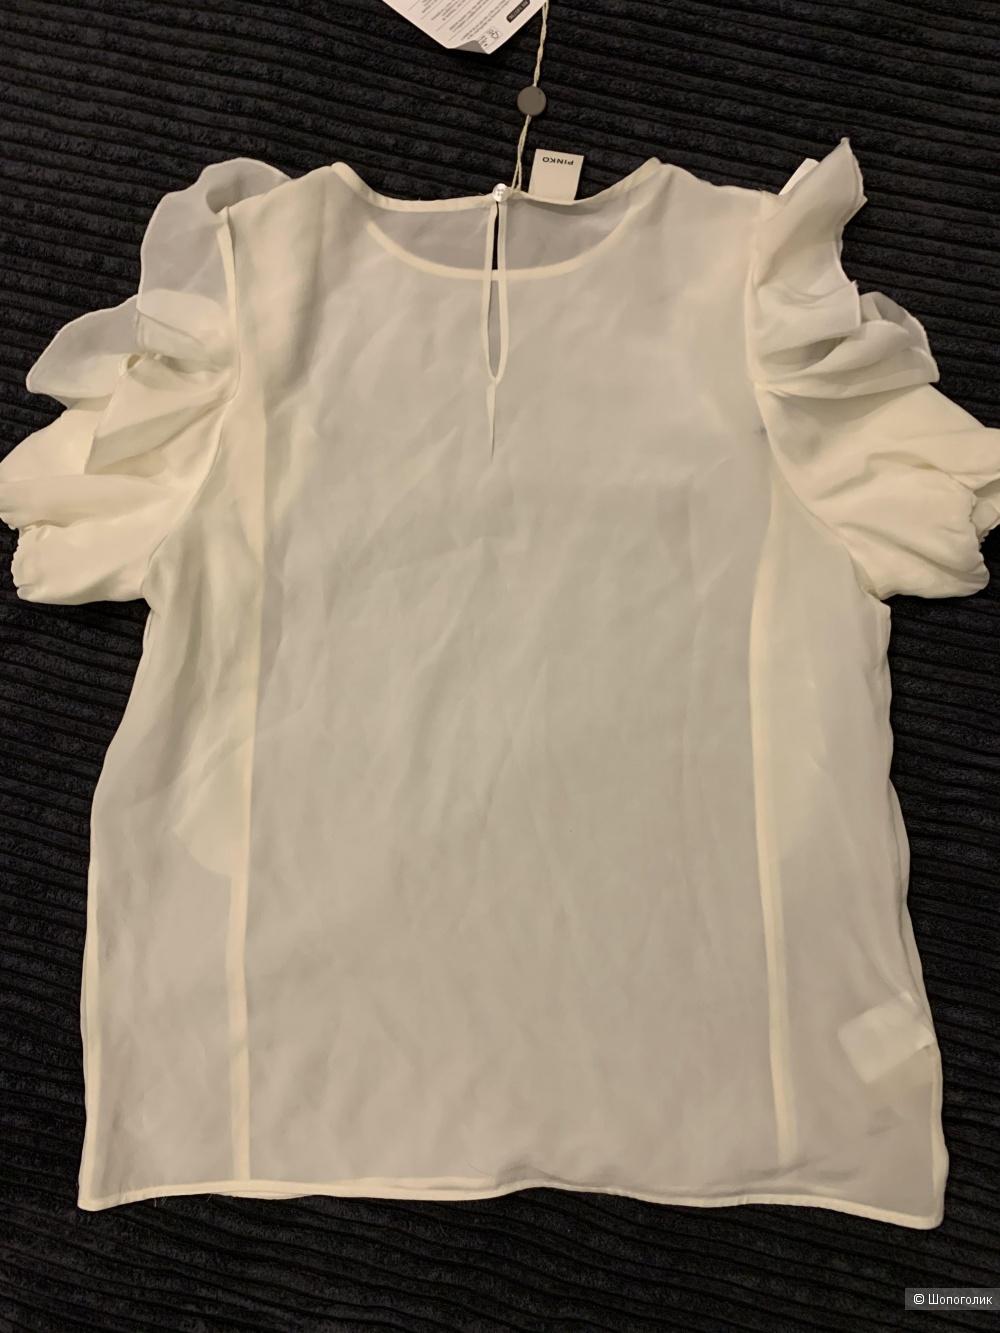 Шелковый топ-блузка PINKO размер it42-uk10-рус44